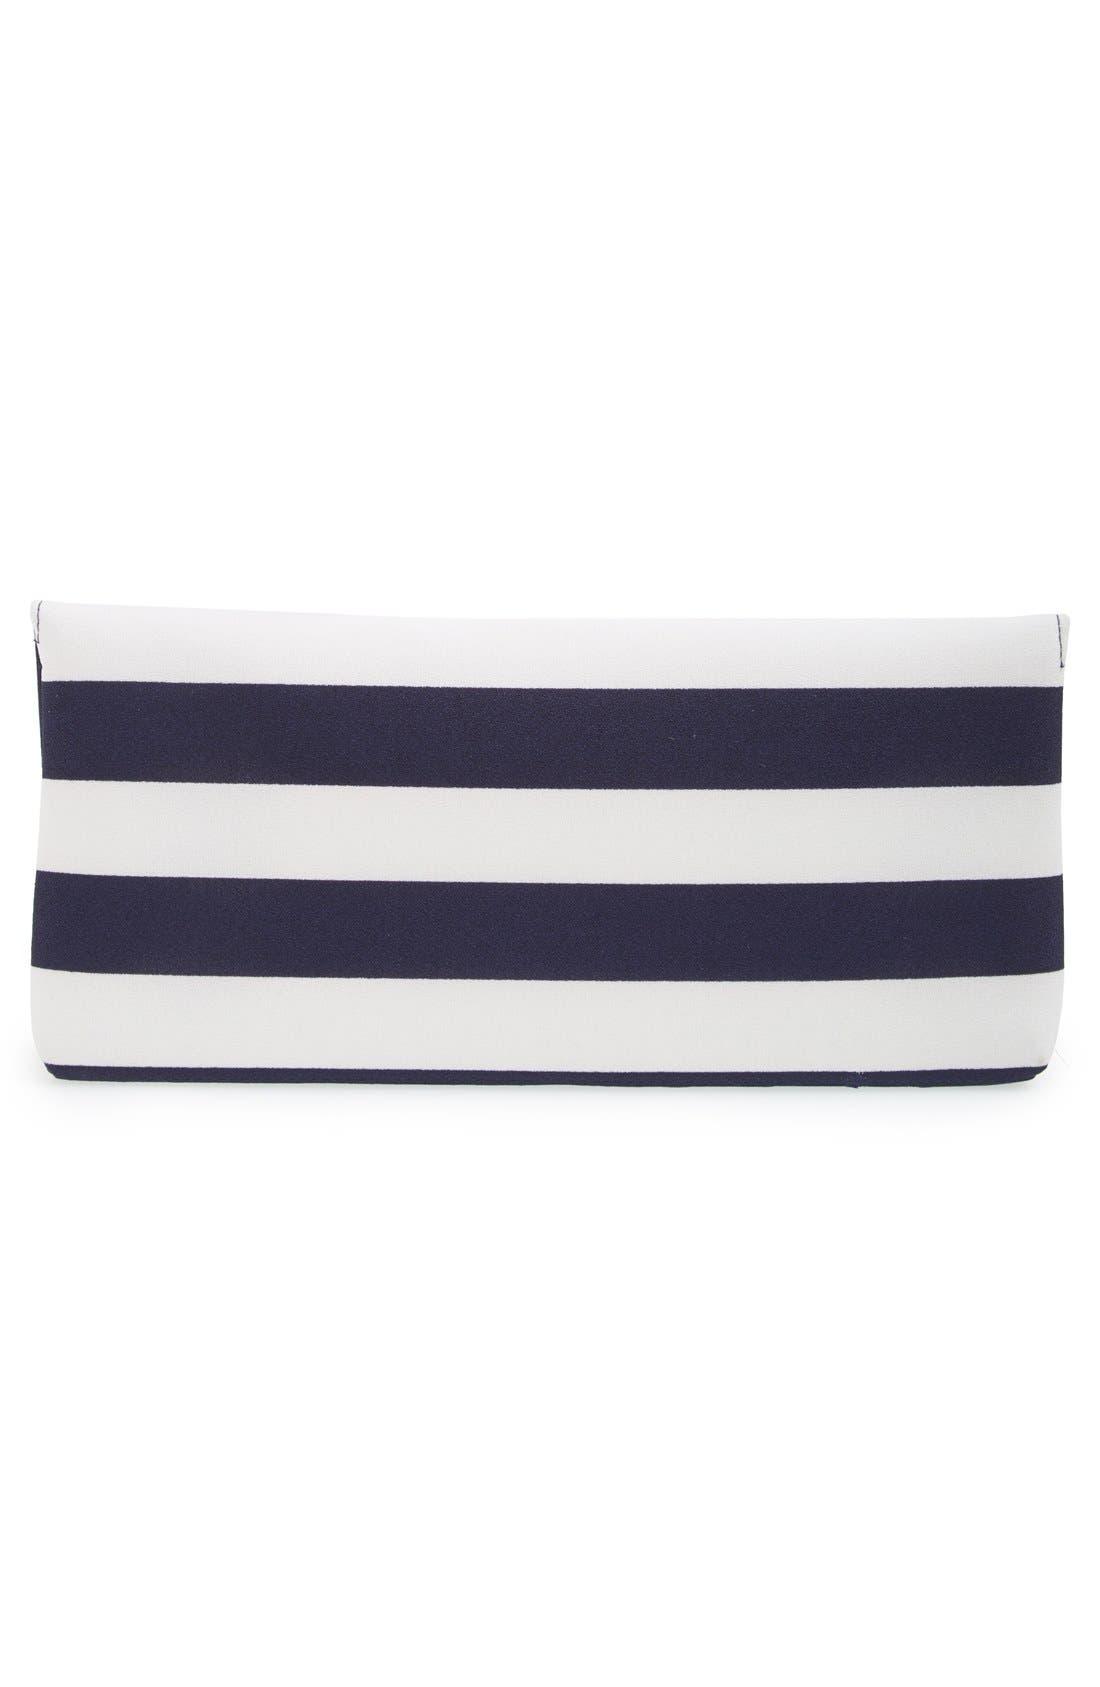 ,                             'Berenice' Embellished Stripe Clutch,                             Alternate thumbnail 4, color,                             400